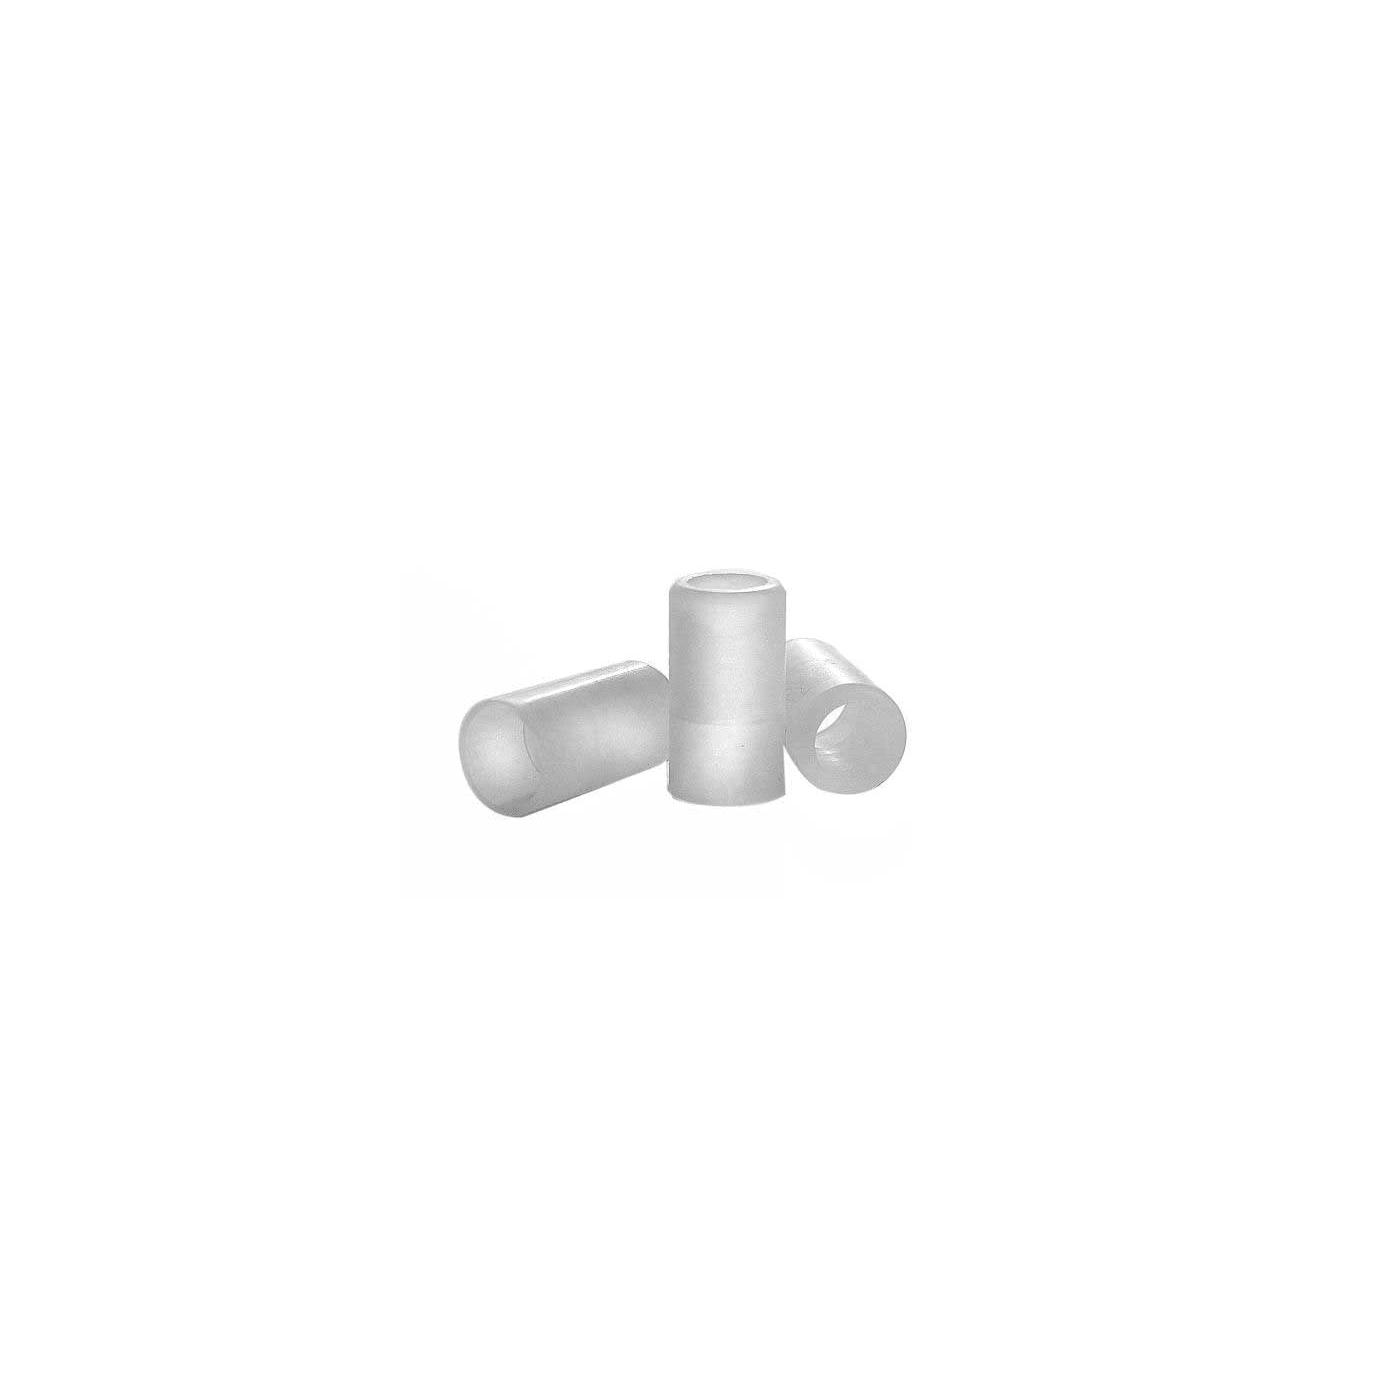 Innokin iSub Drip Tip Cover - 1000 pack